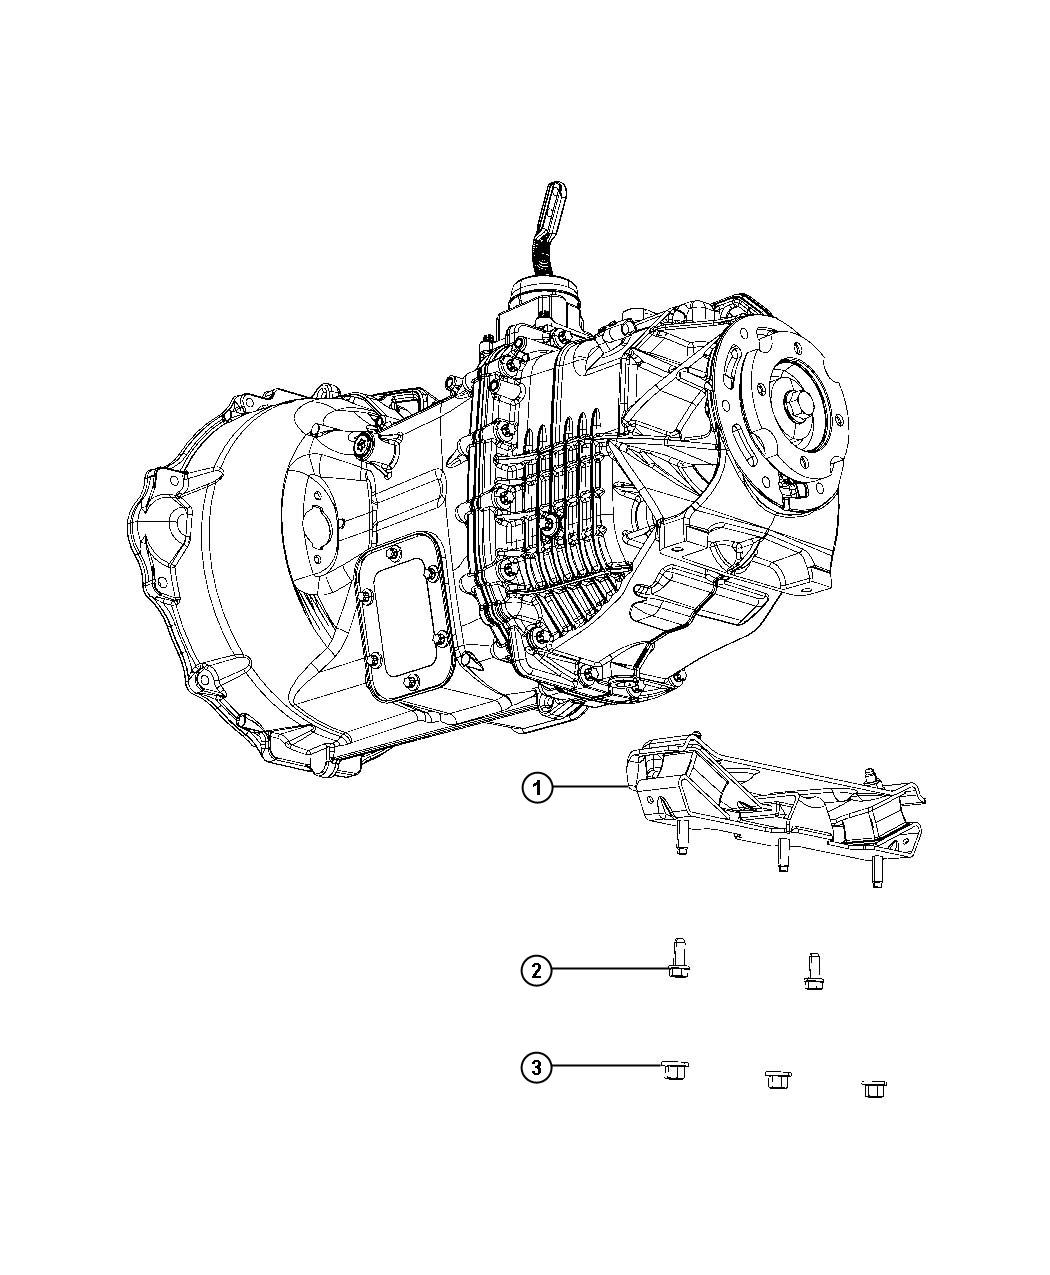 2015 Ram 5500 Bracket and insulator. Two wheel drive